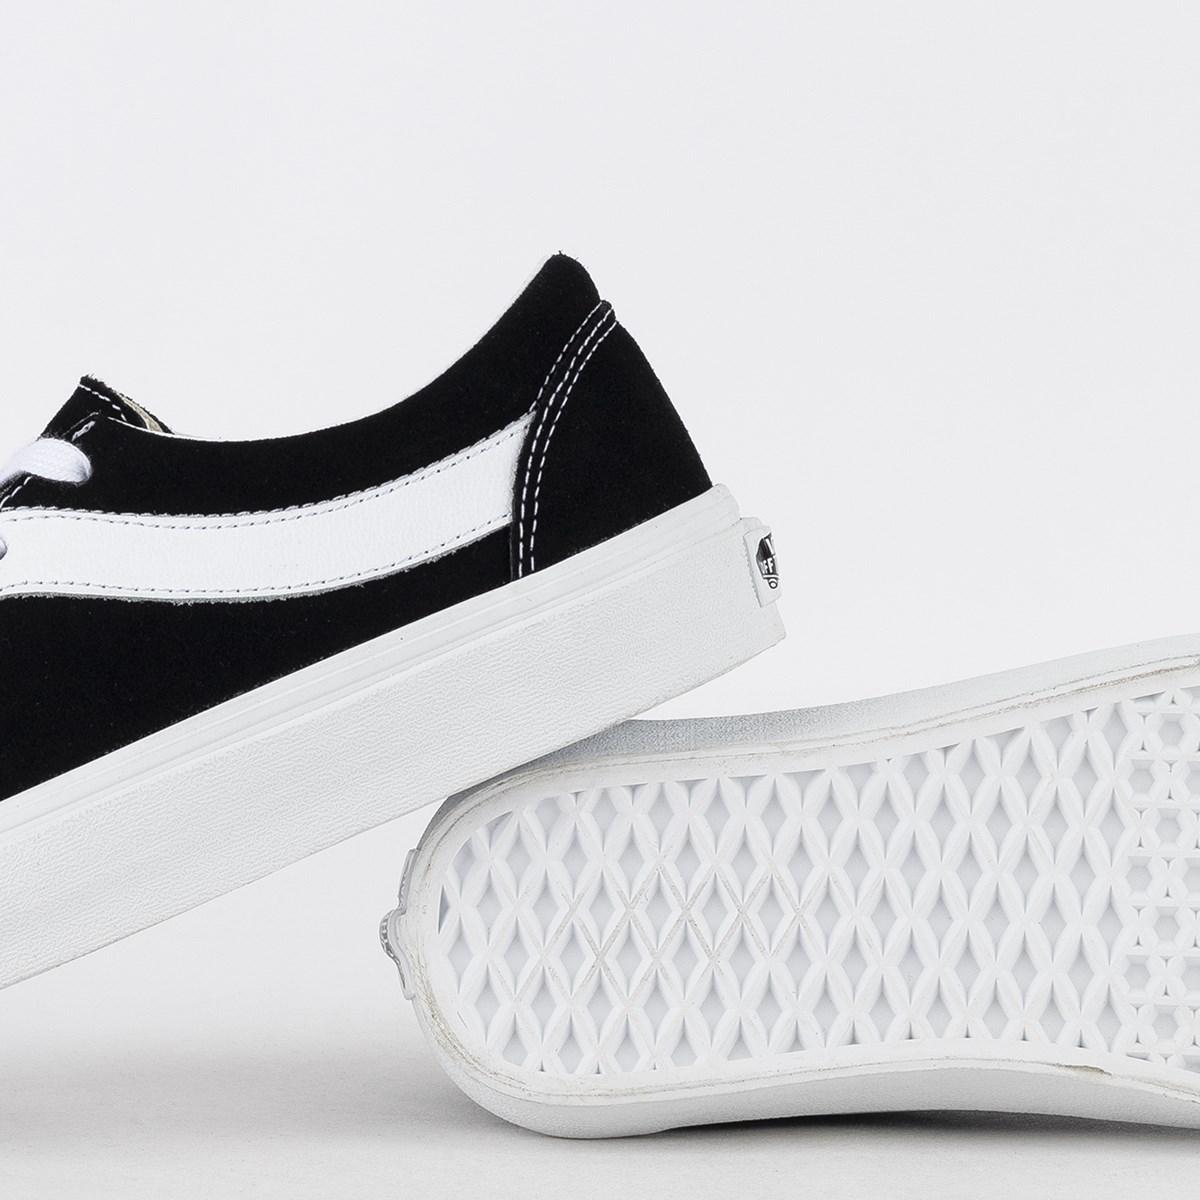 Tênis Vans Bold Ni Distort Black True White VN0A3WLPVX6